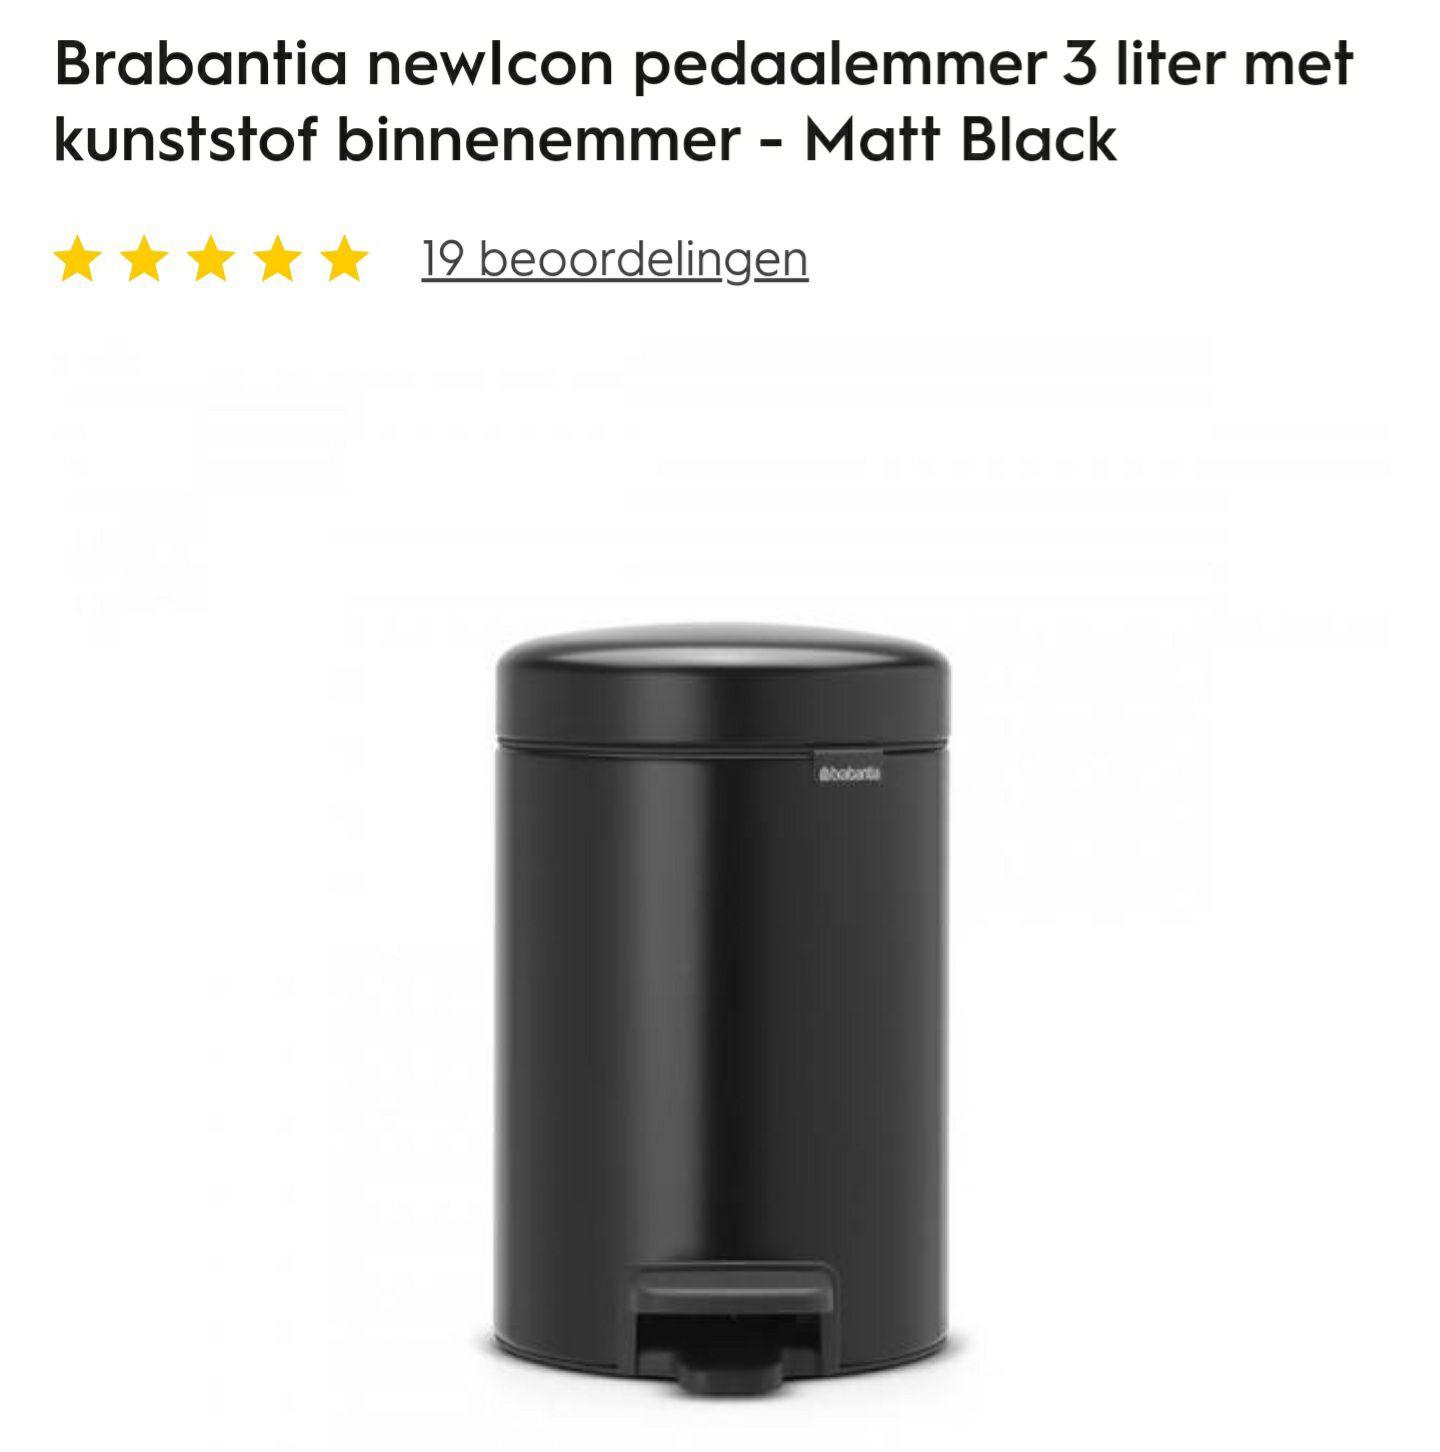 [25+10% korting] Brabantia Softclose Pedaalemmers NewIcon 3/5/12/30 liter (MattBlack/Platinum)